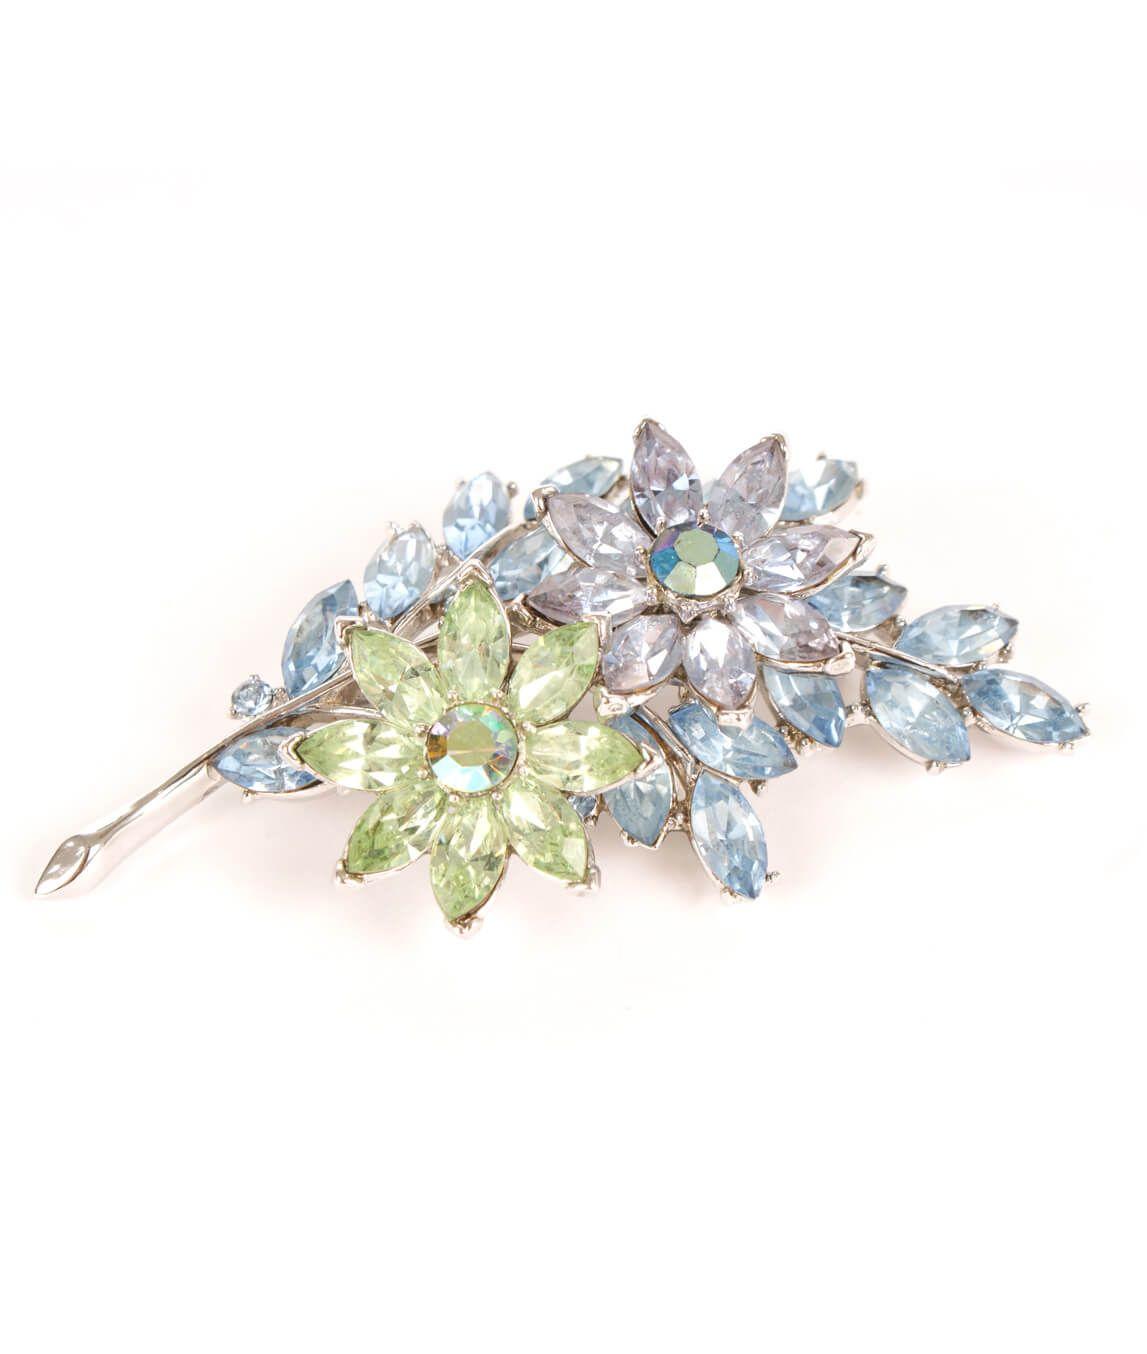 Vintage 1950s Trifari pastel crystal brooch pin